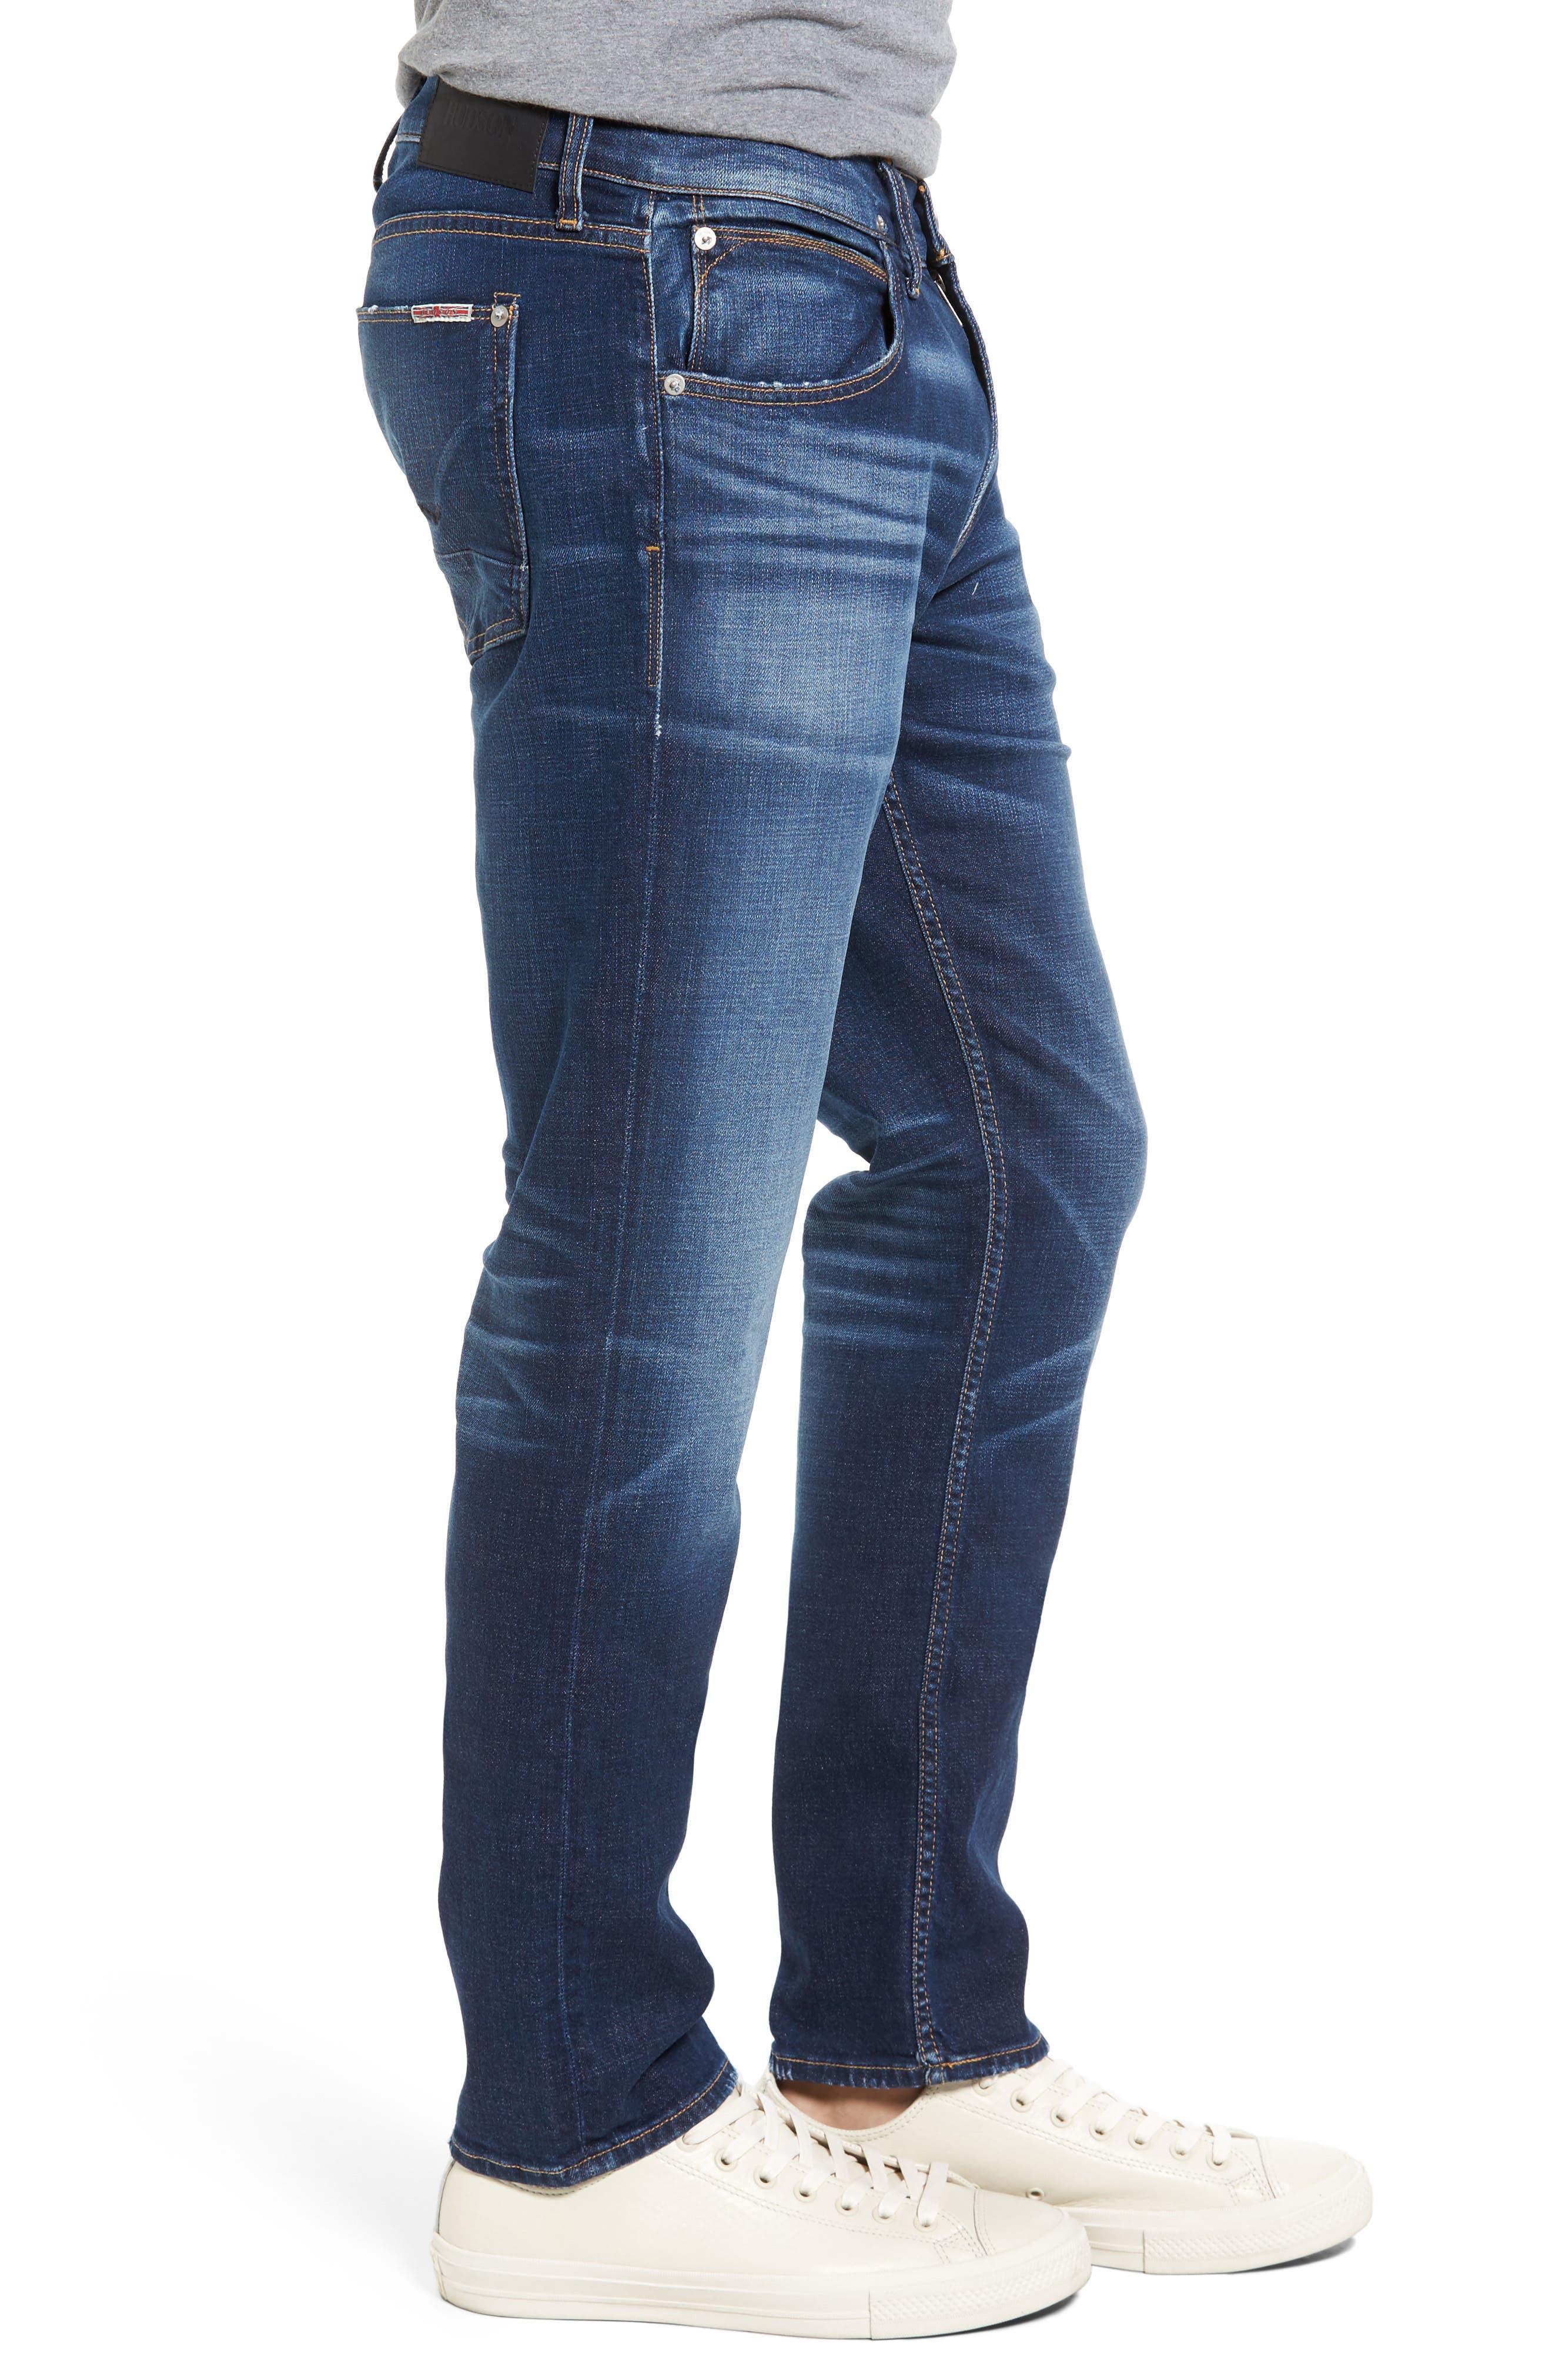 Blake Slim Fit Jeans,                             Alternate thumbnail 3, color,                             Genuine